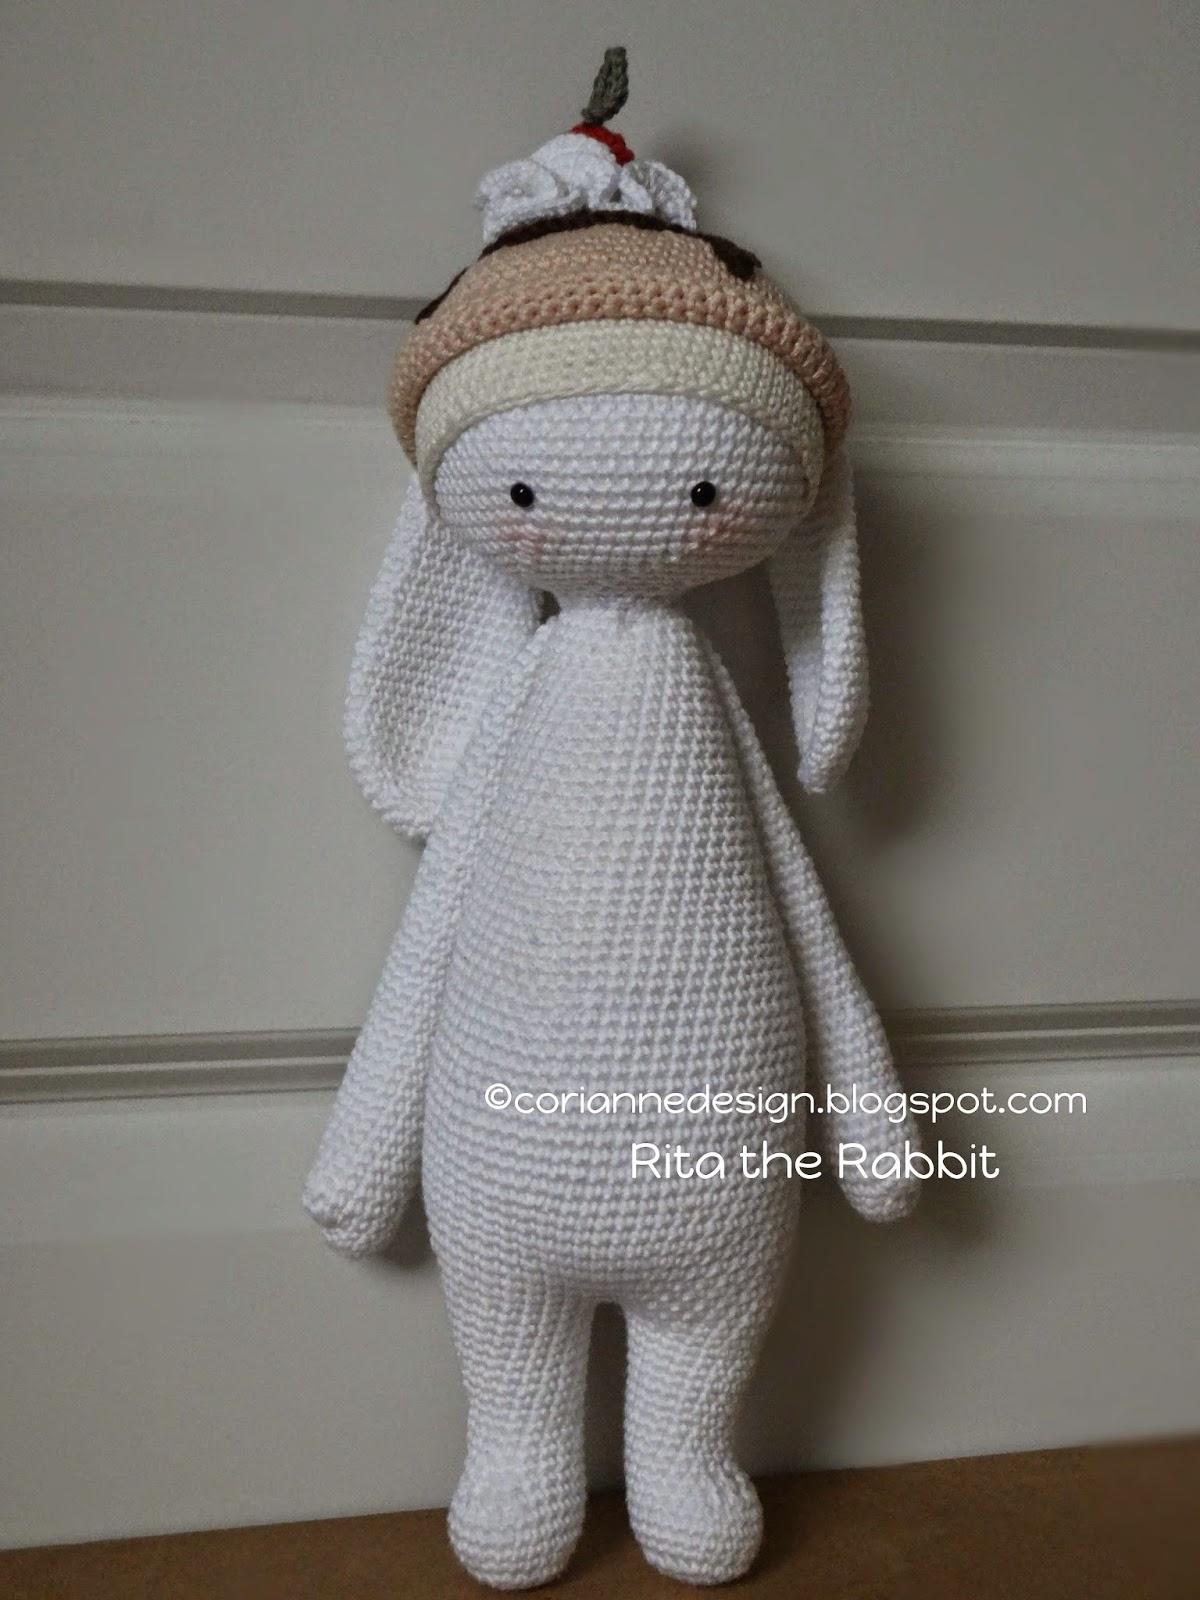 Amigurumi Dolls By Artist Lydia Tresselt : Corianne Design: My little Lalylala family